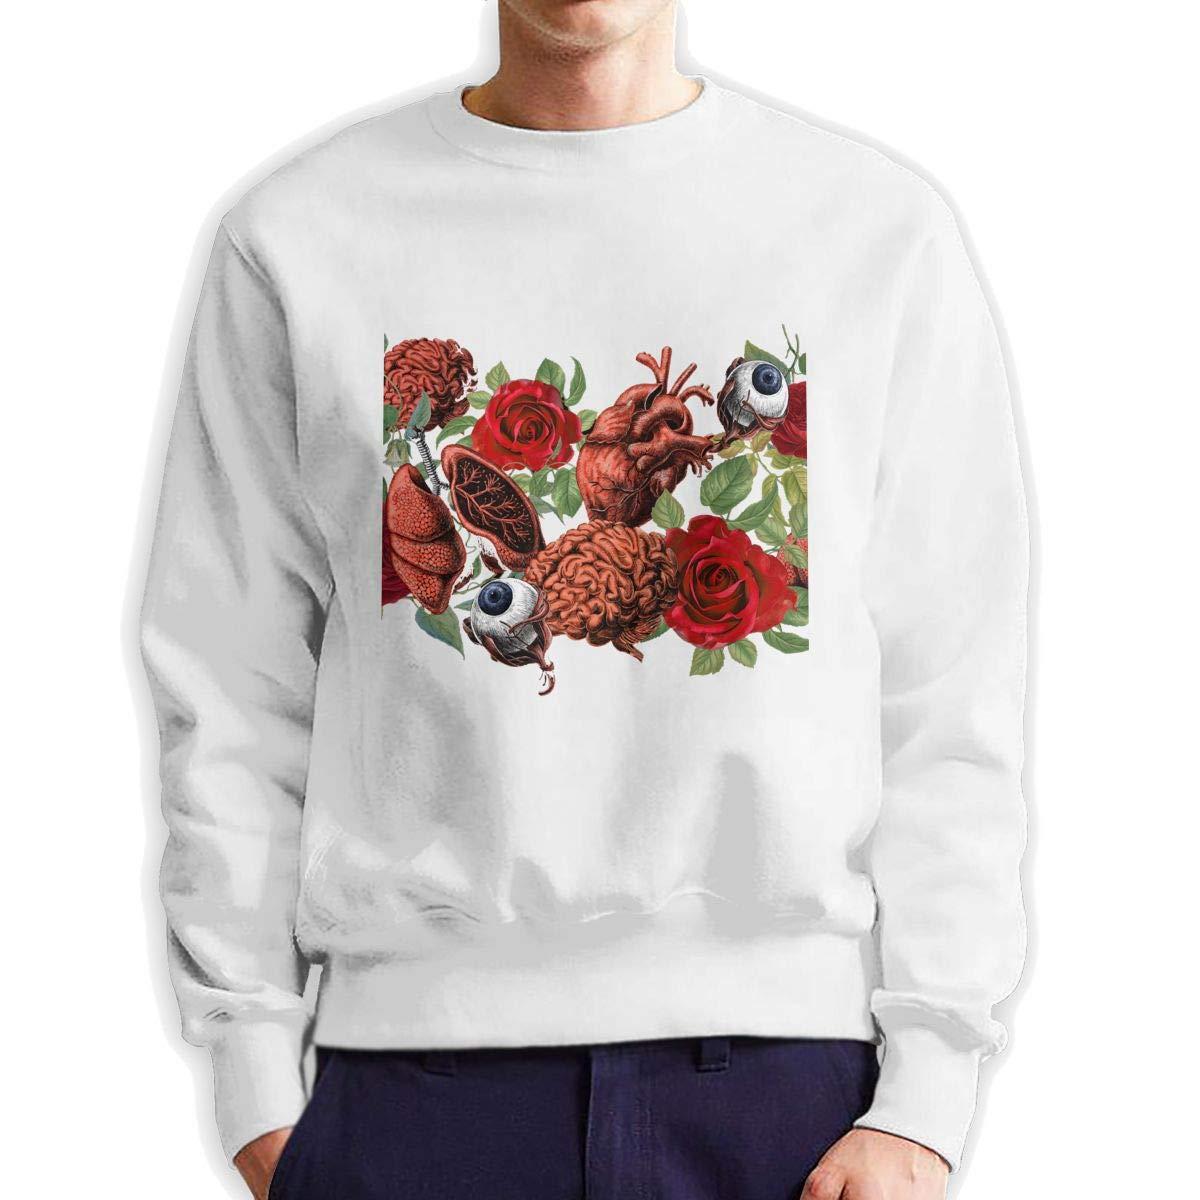 RUANJB Mens Flower and Eye Long Sleeve Crewneck Sweatshirt